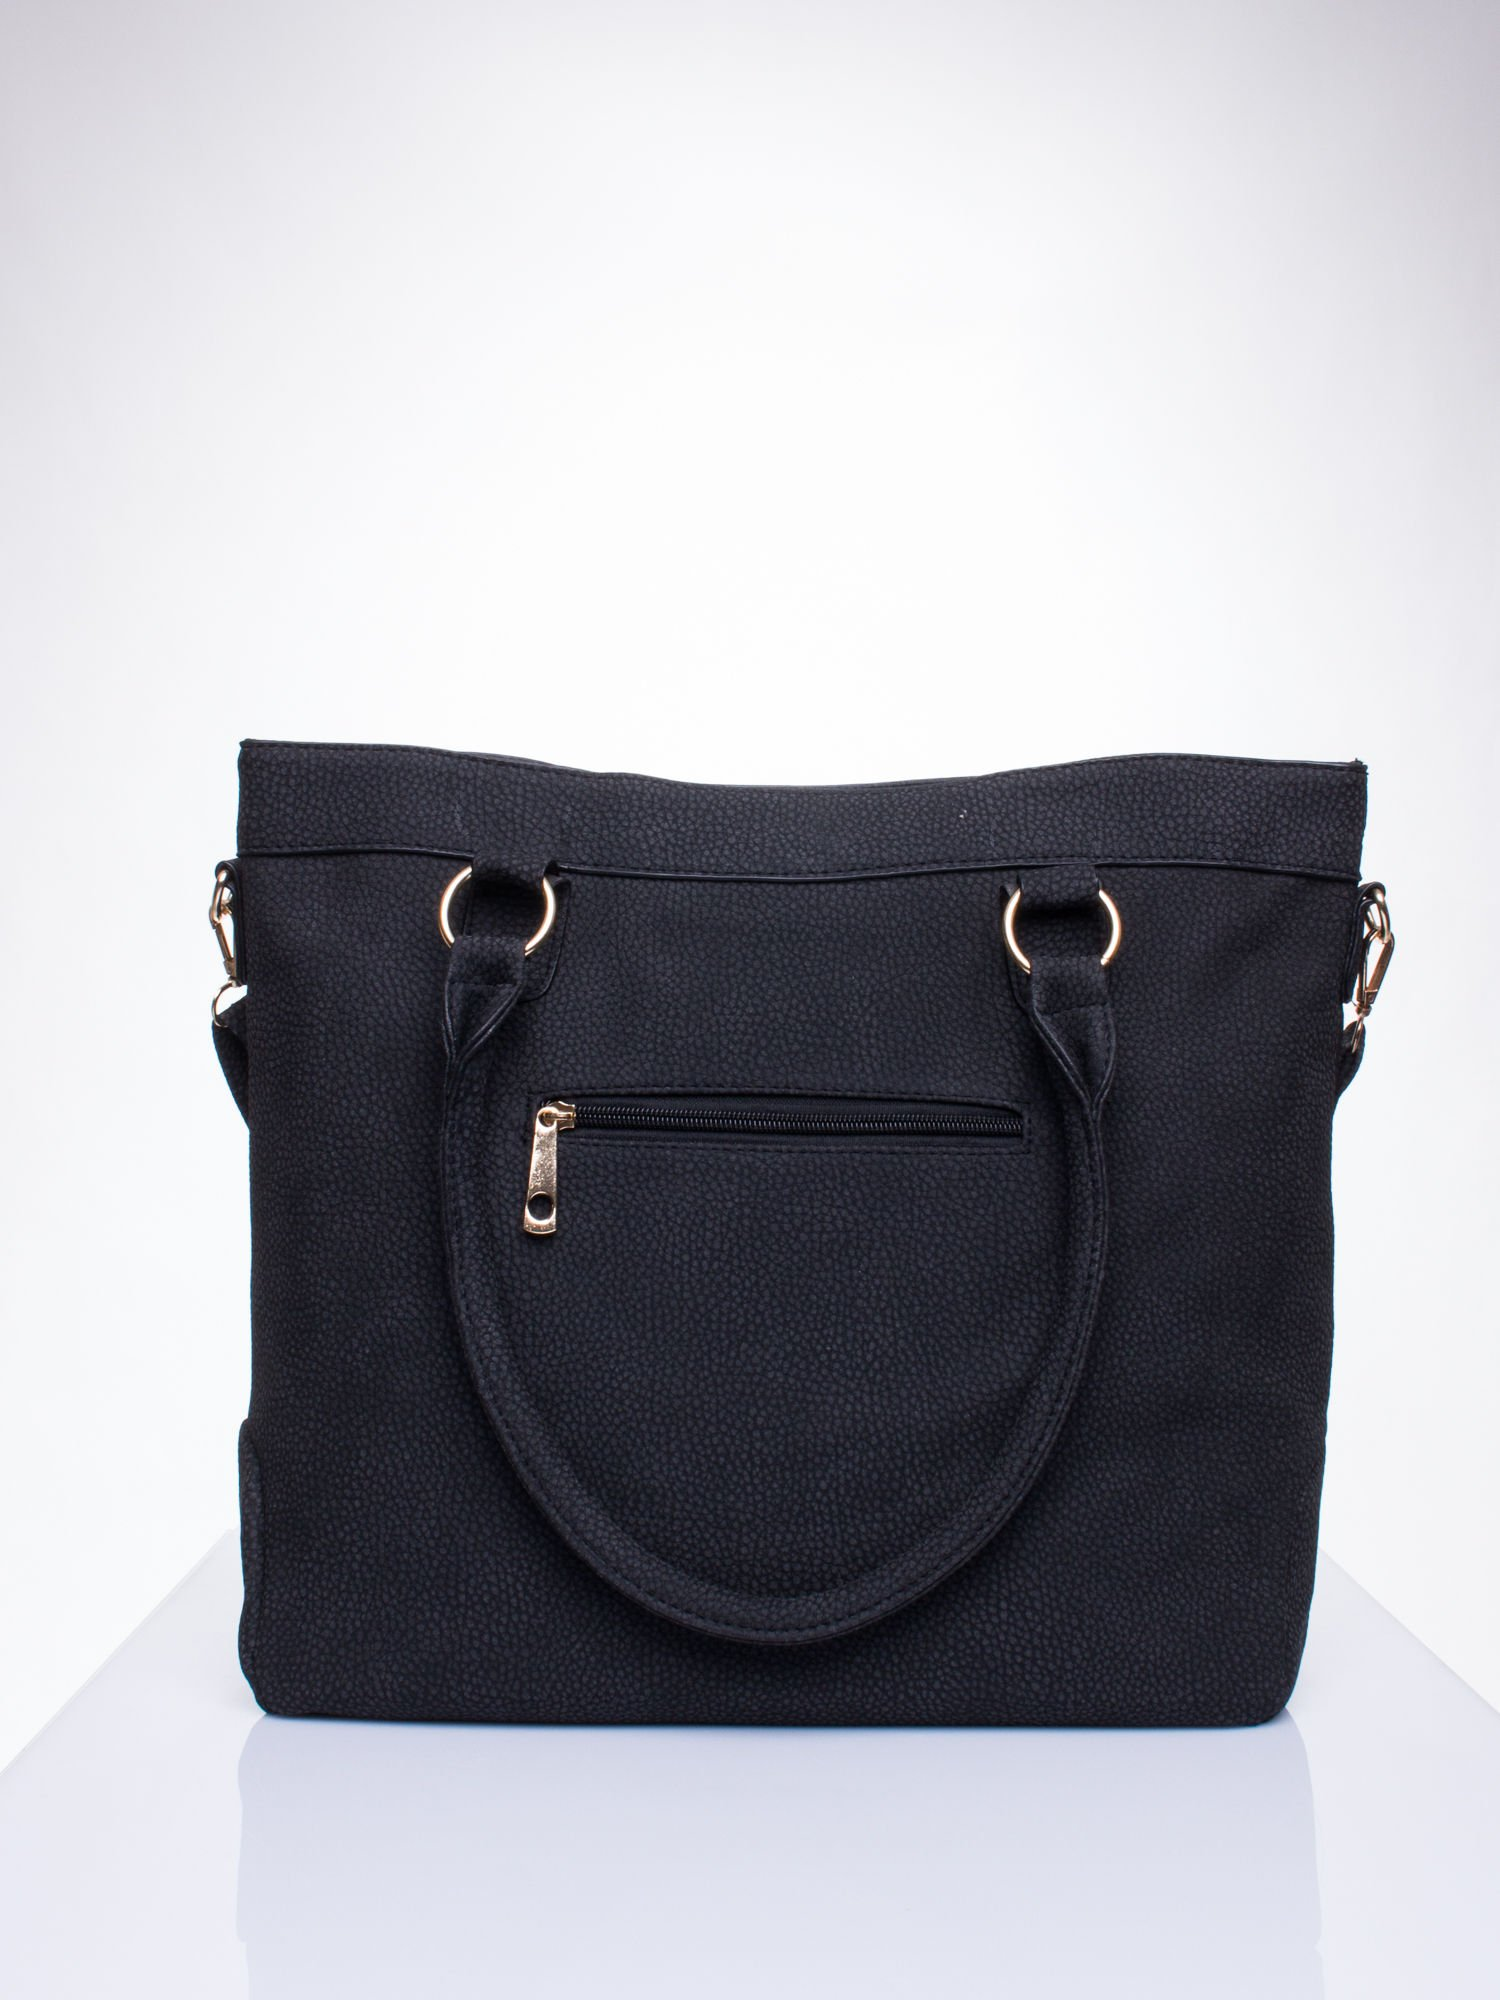 Czarna fakturowana torebka z klamerkami                                  zdj.                                  3